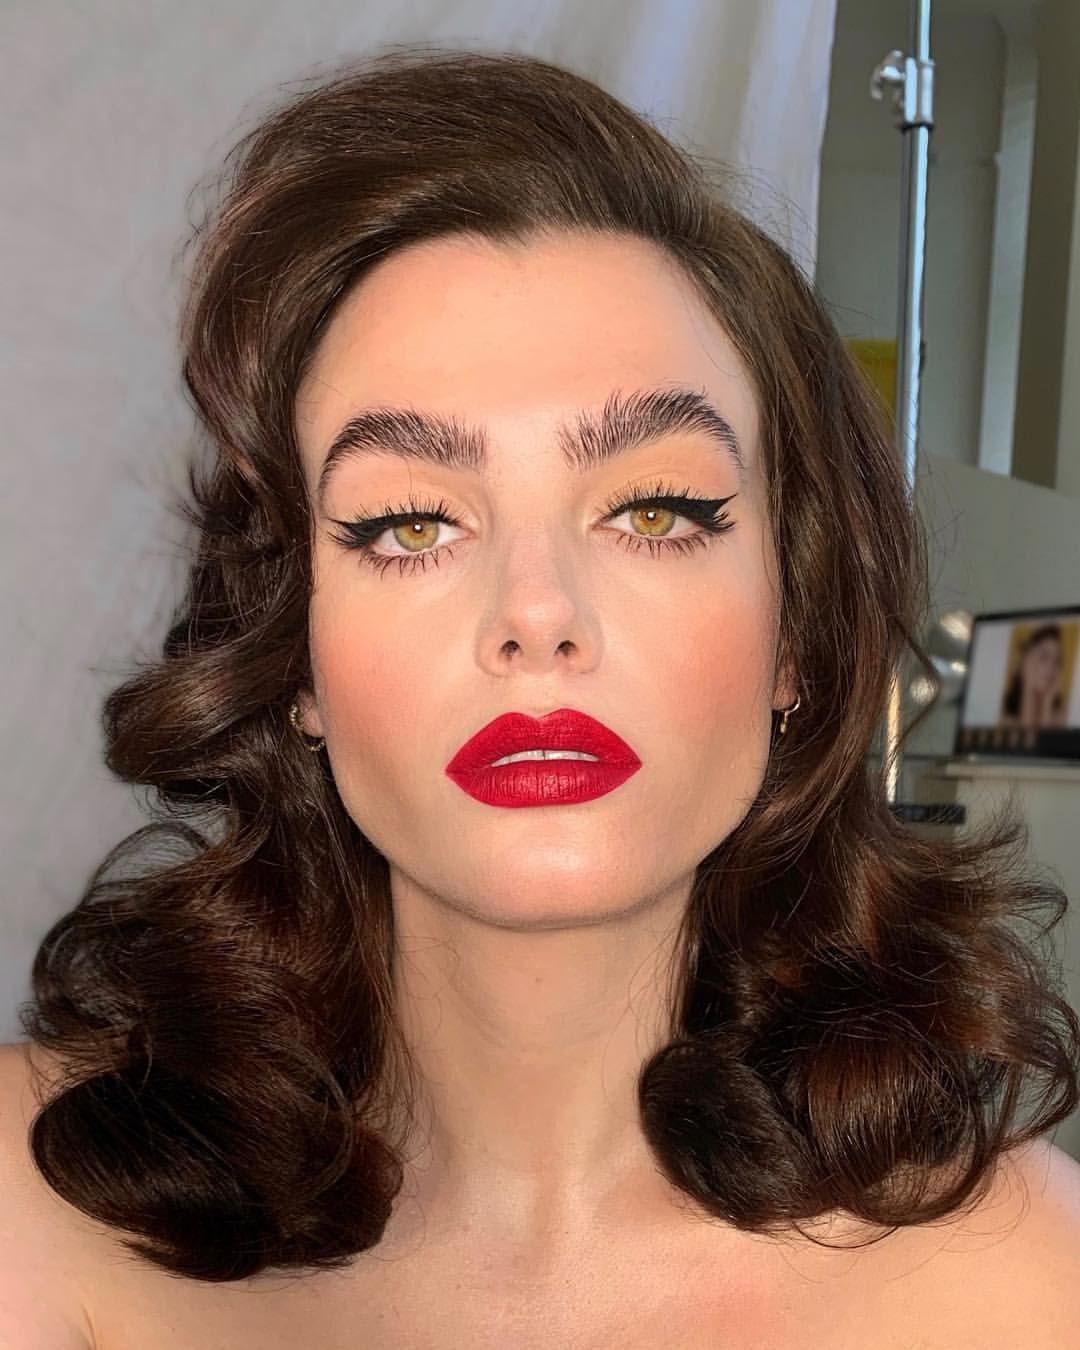 The divine charlihoward Lip is makeup54 DiscoRed ♥️